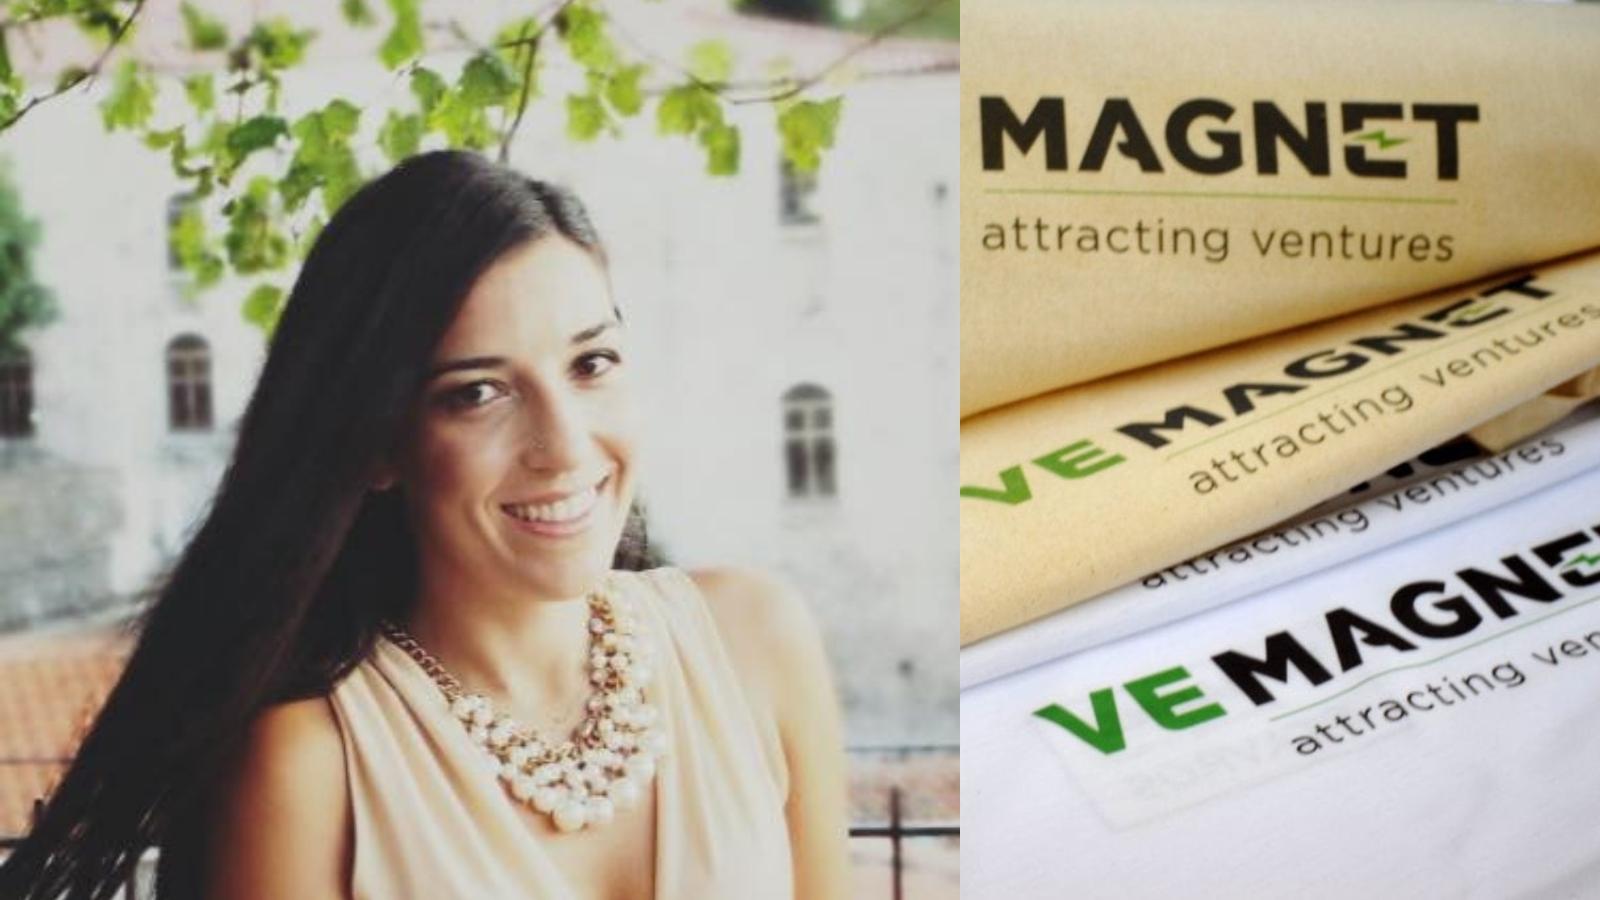 Vemagnet: Η crowdfunding πλατφόρμα που λύνει τα χέρια κάθε επιχείρησης